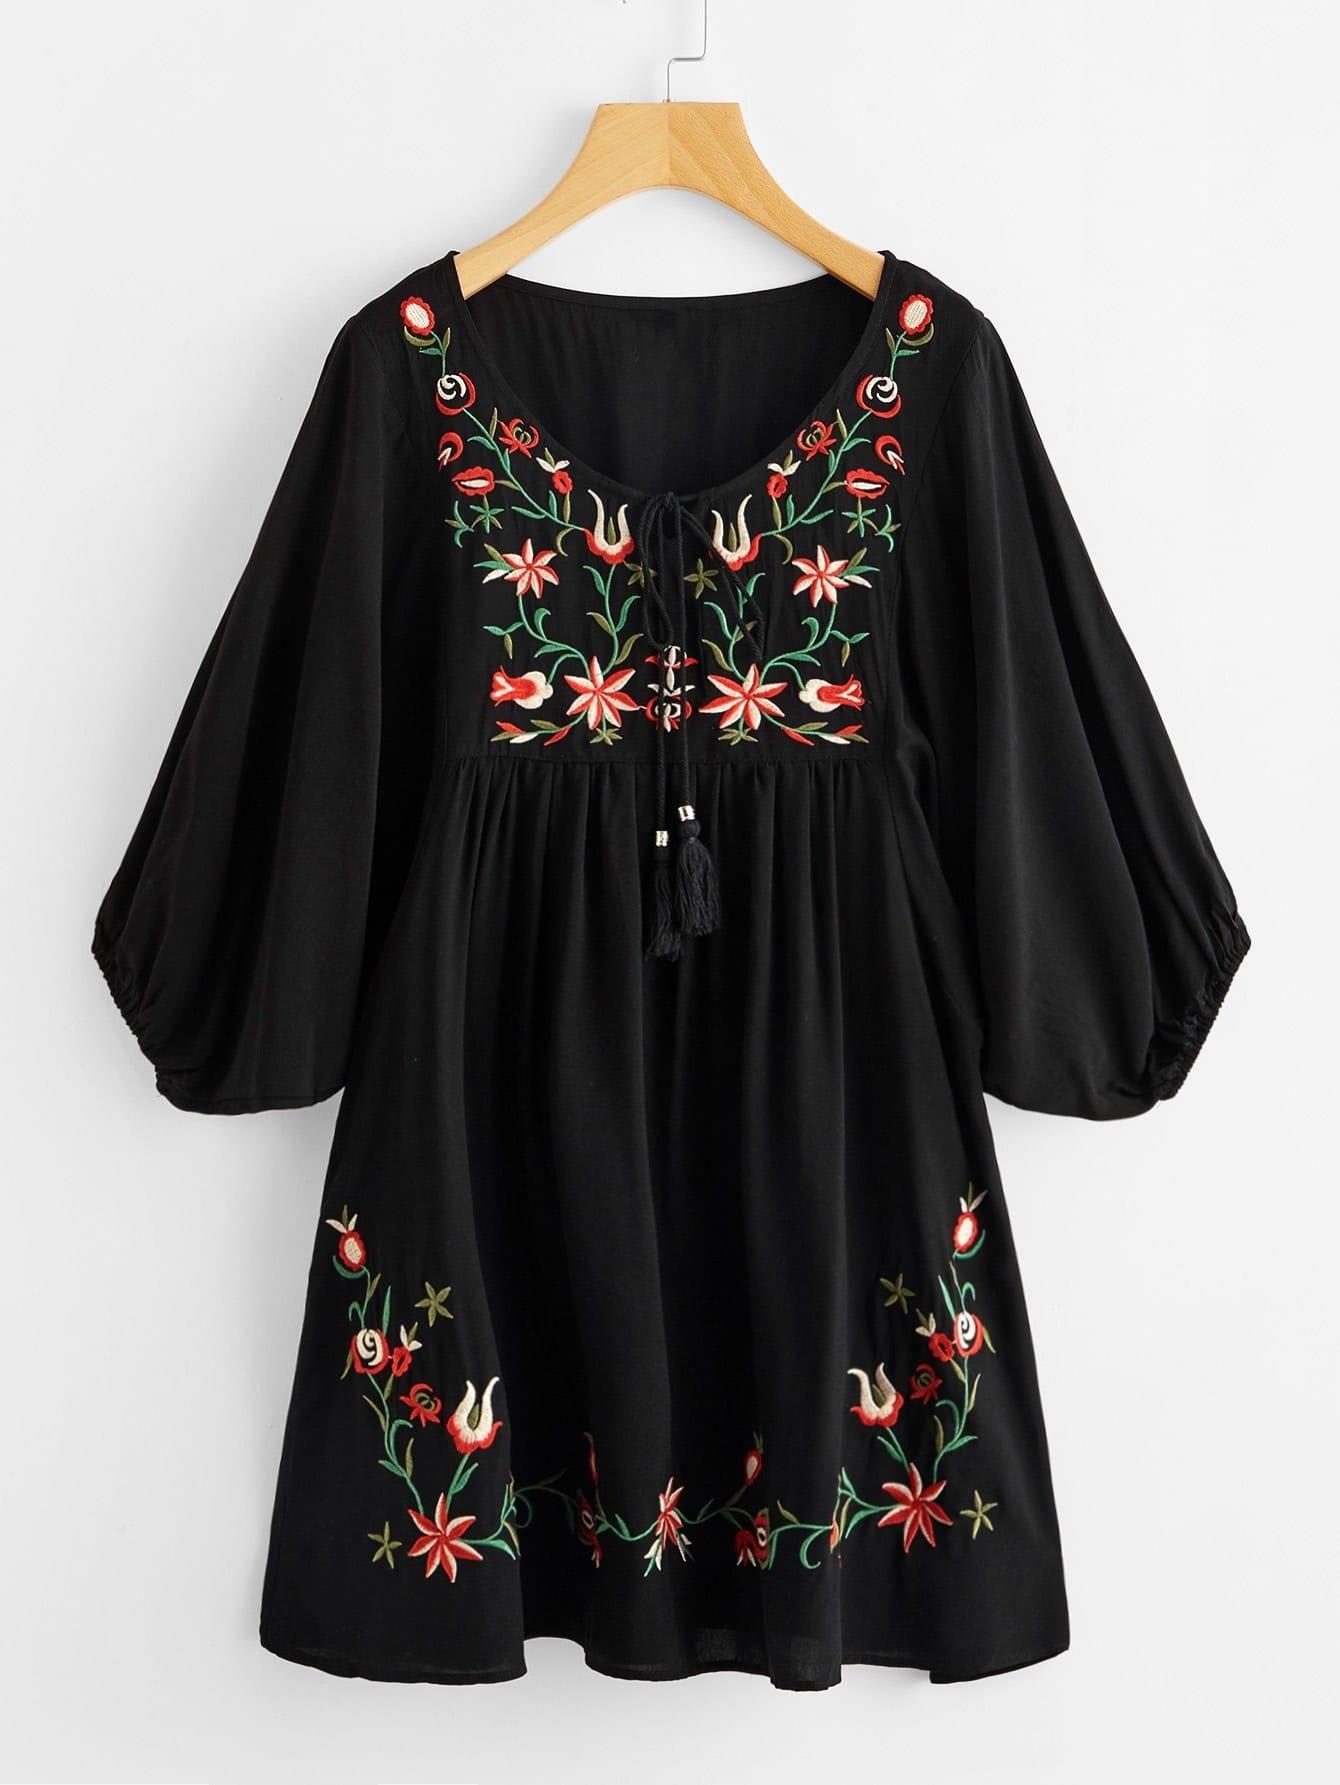 Tasseled Tie Neck Lantern Sleeve Embroidered Smock Dress цена 2017